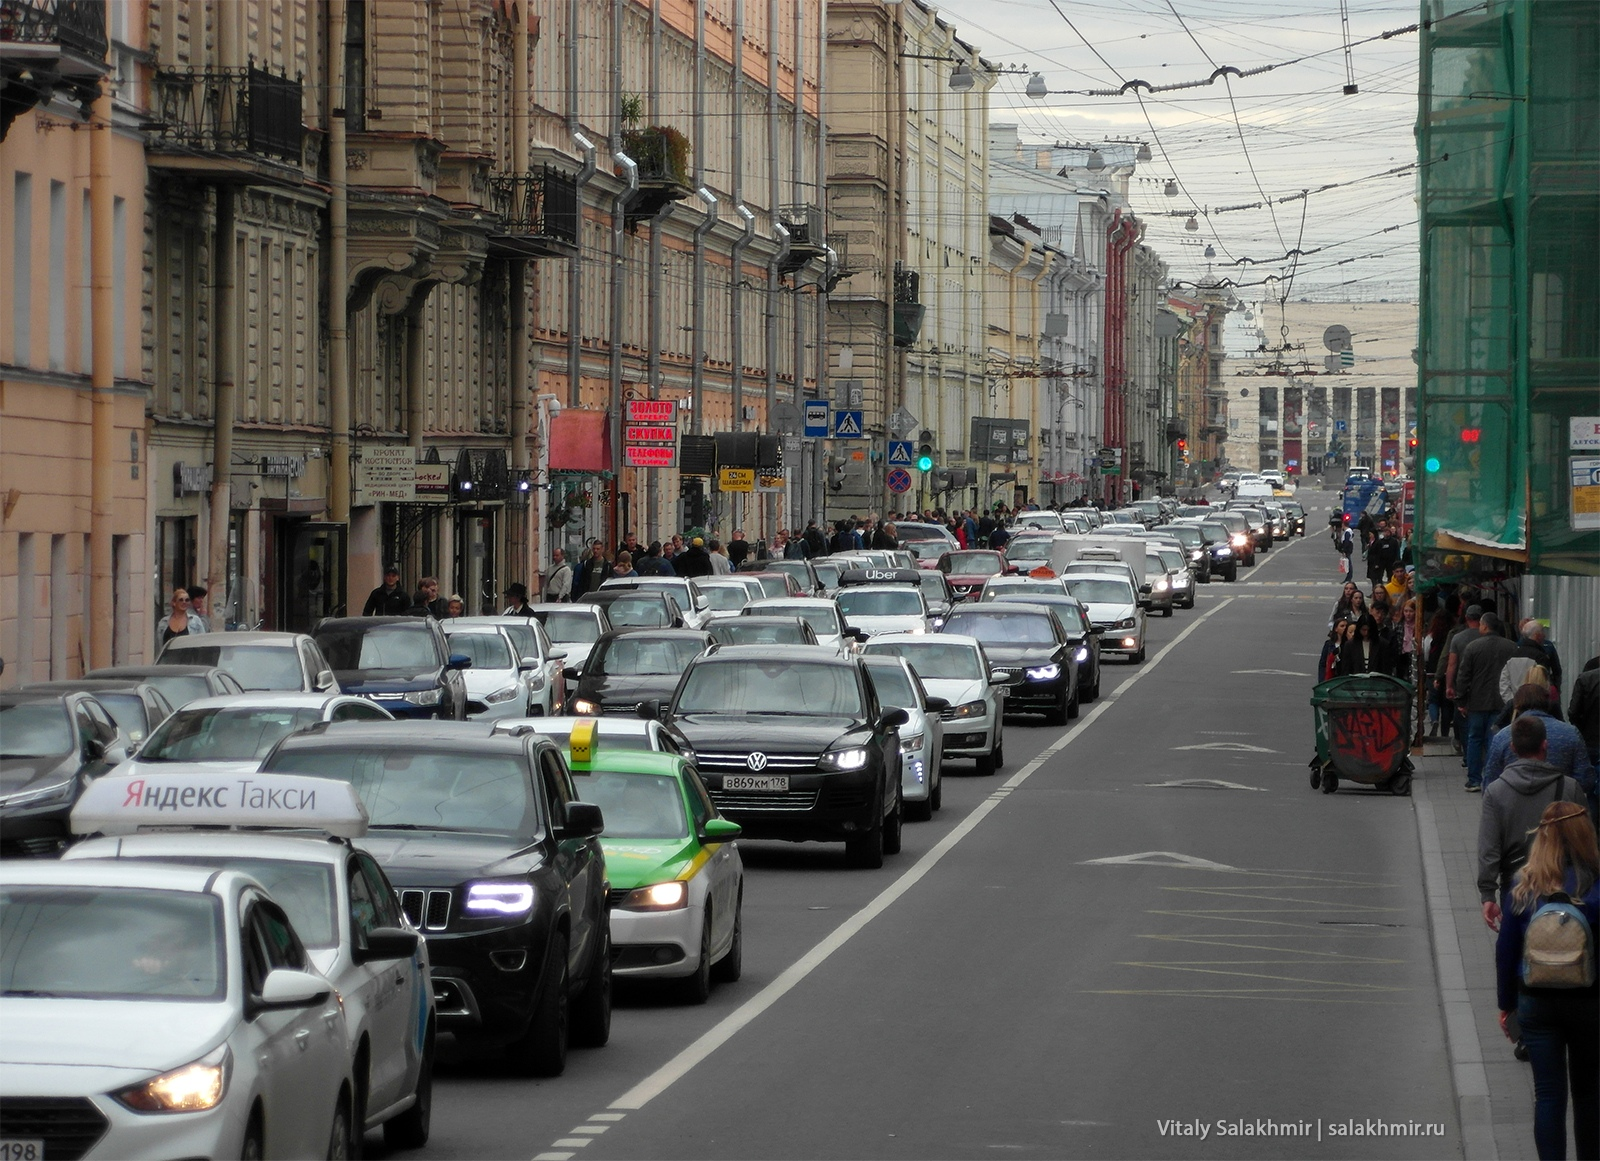 Центр Санкт-Петербурга, лето 2019